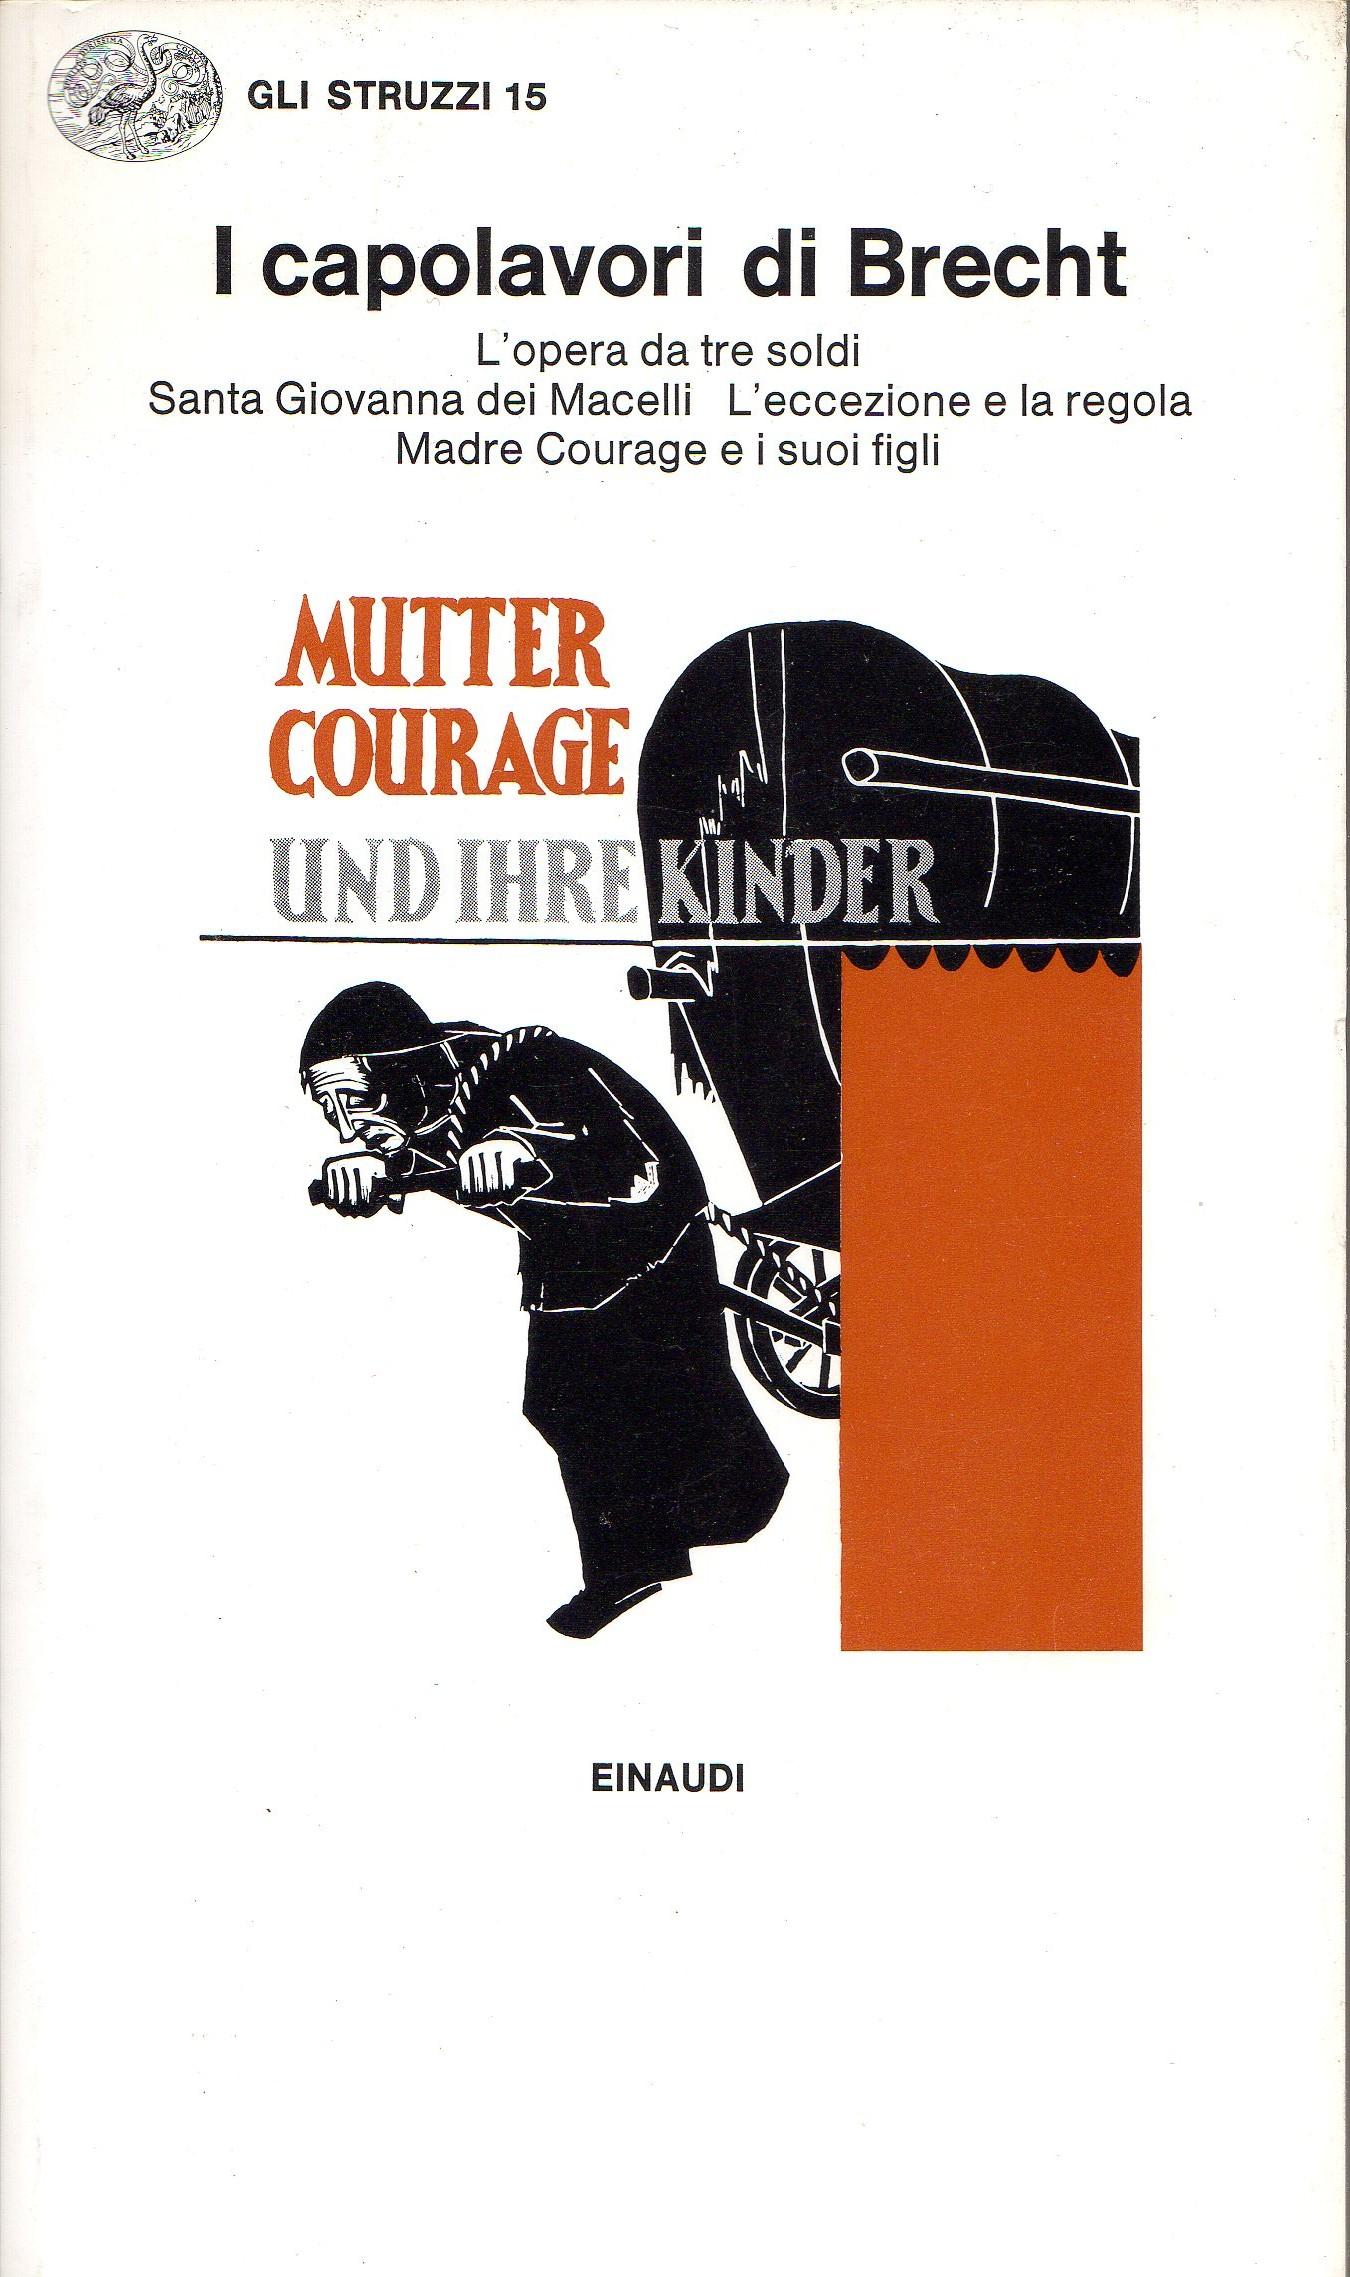 I capolavori di Brecht - Vol. I